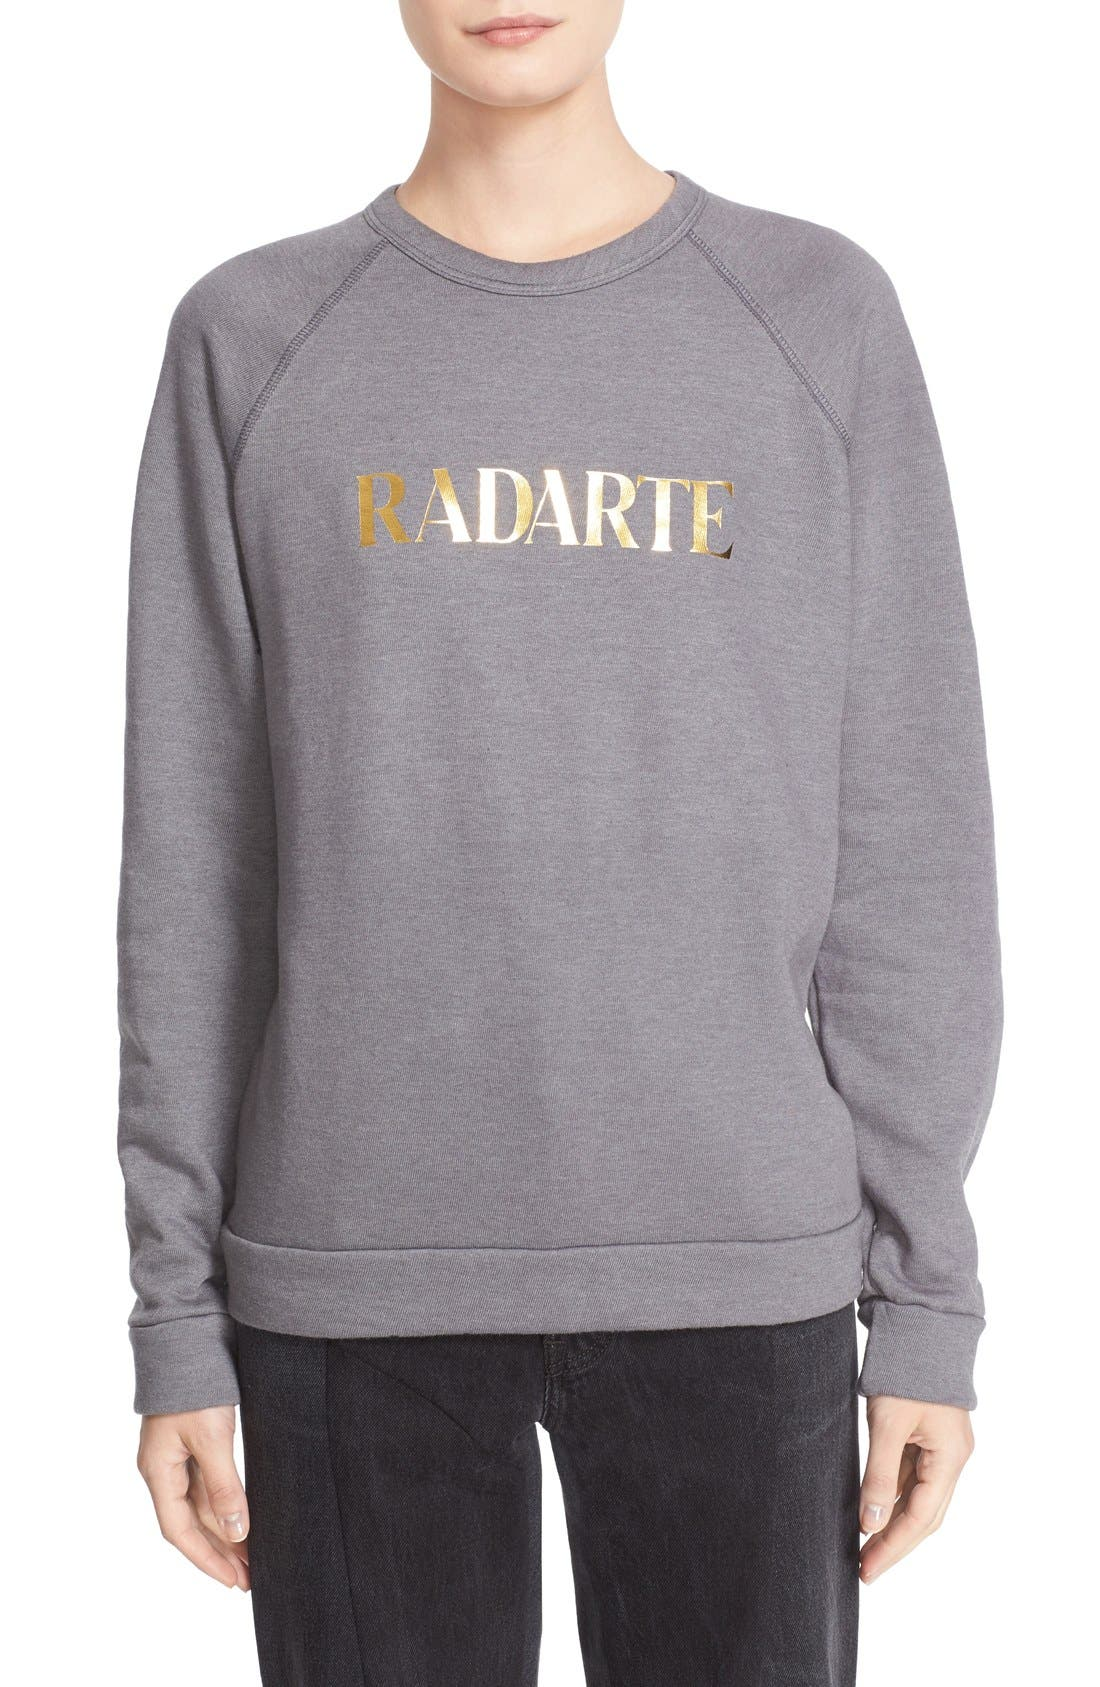 'Radarte' Foil Sweatshirt,                             Main thumbnail 1, color,                             022